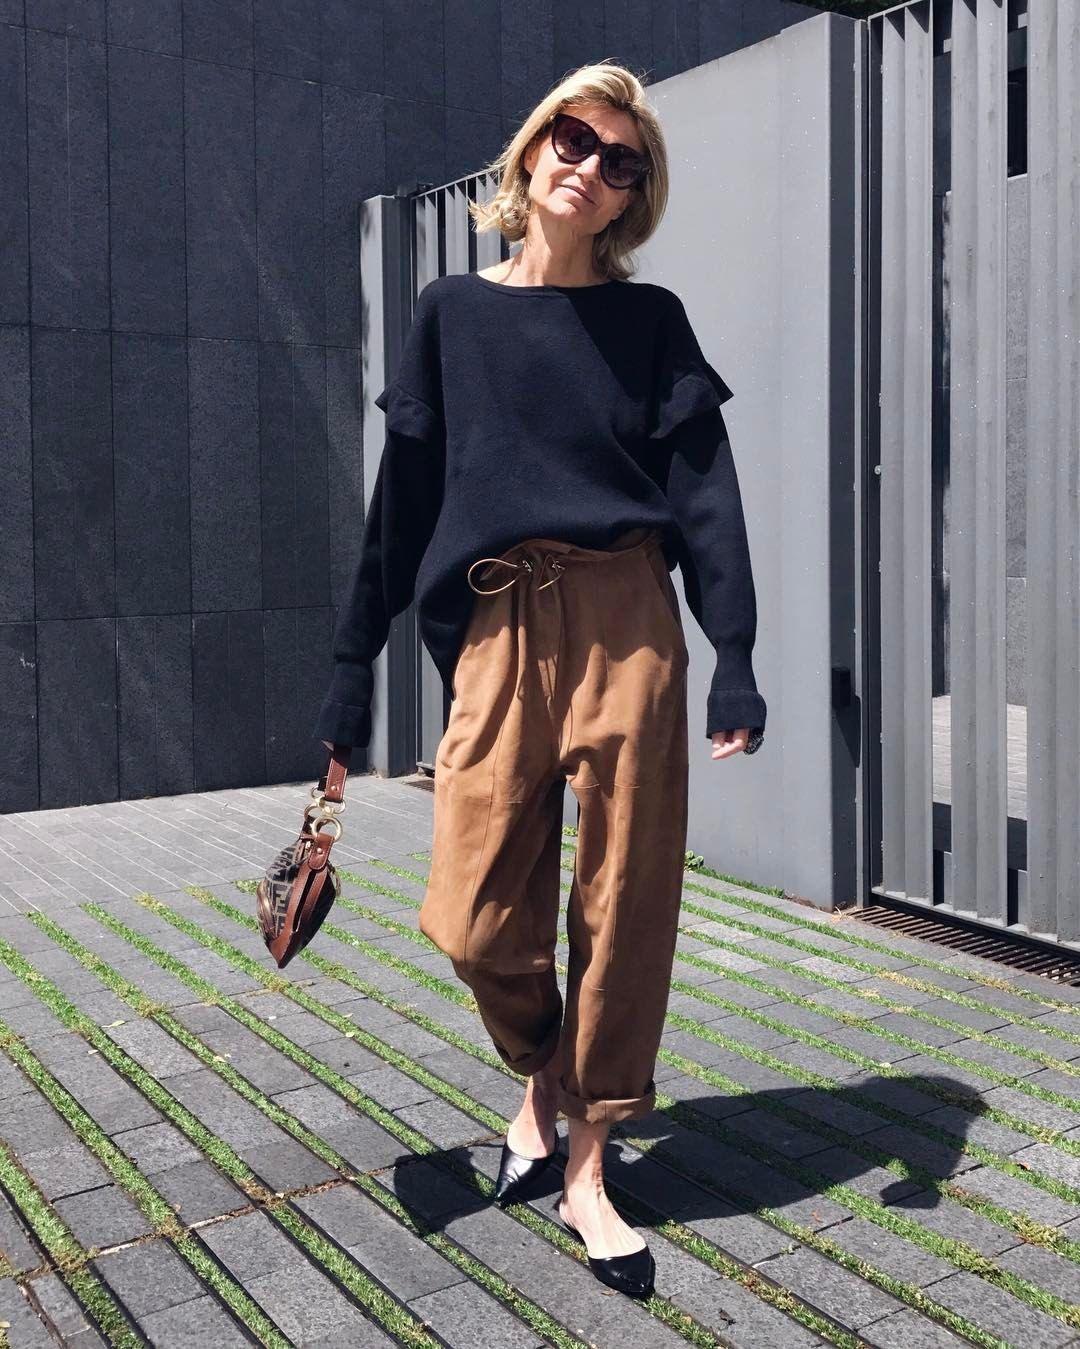 "Patrizia Casarini on Instagram: ""Let's start COMFORTABLE !! #loosefitting  #comfort #suede #suedepants #mango #mystyle #vintage #fendibag"""